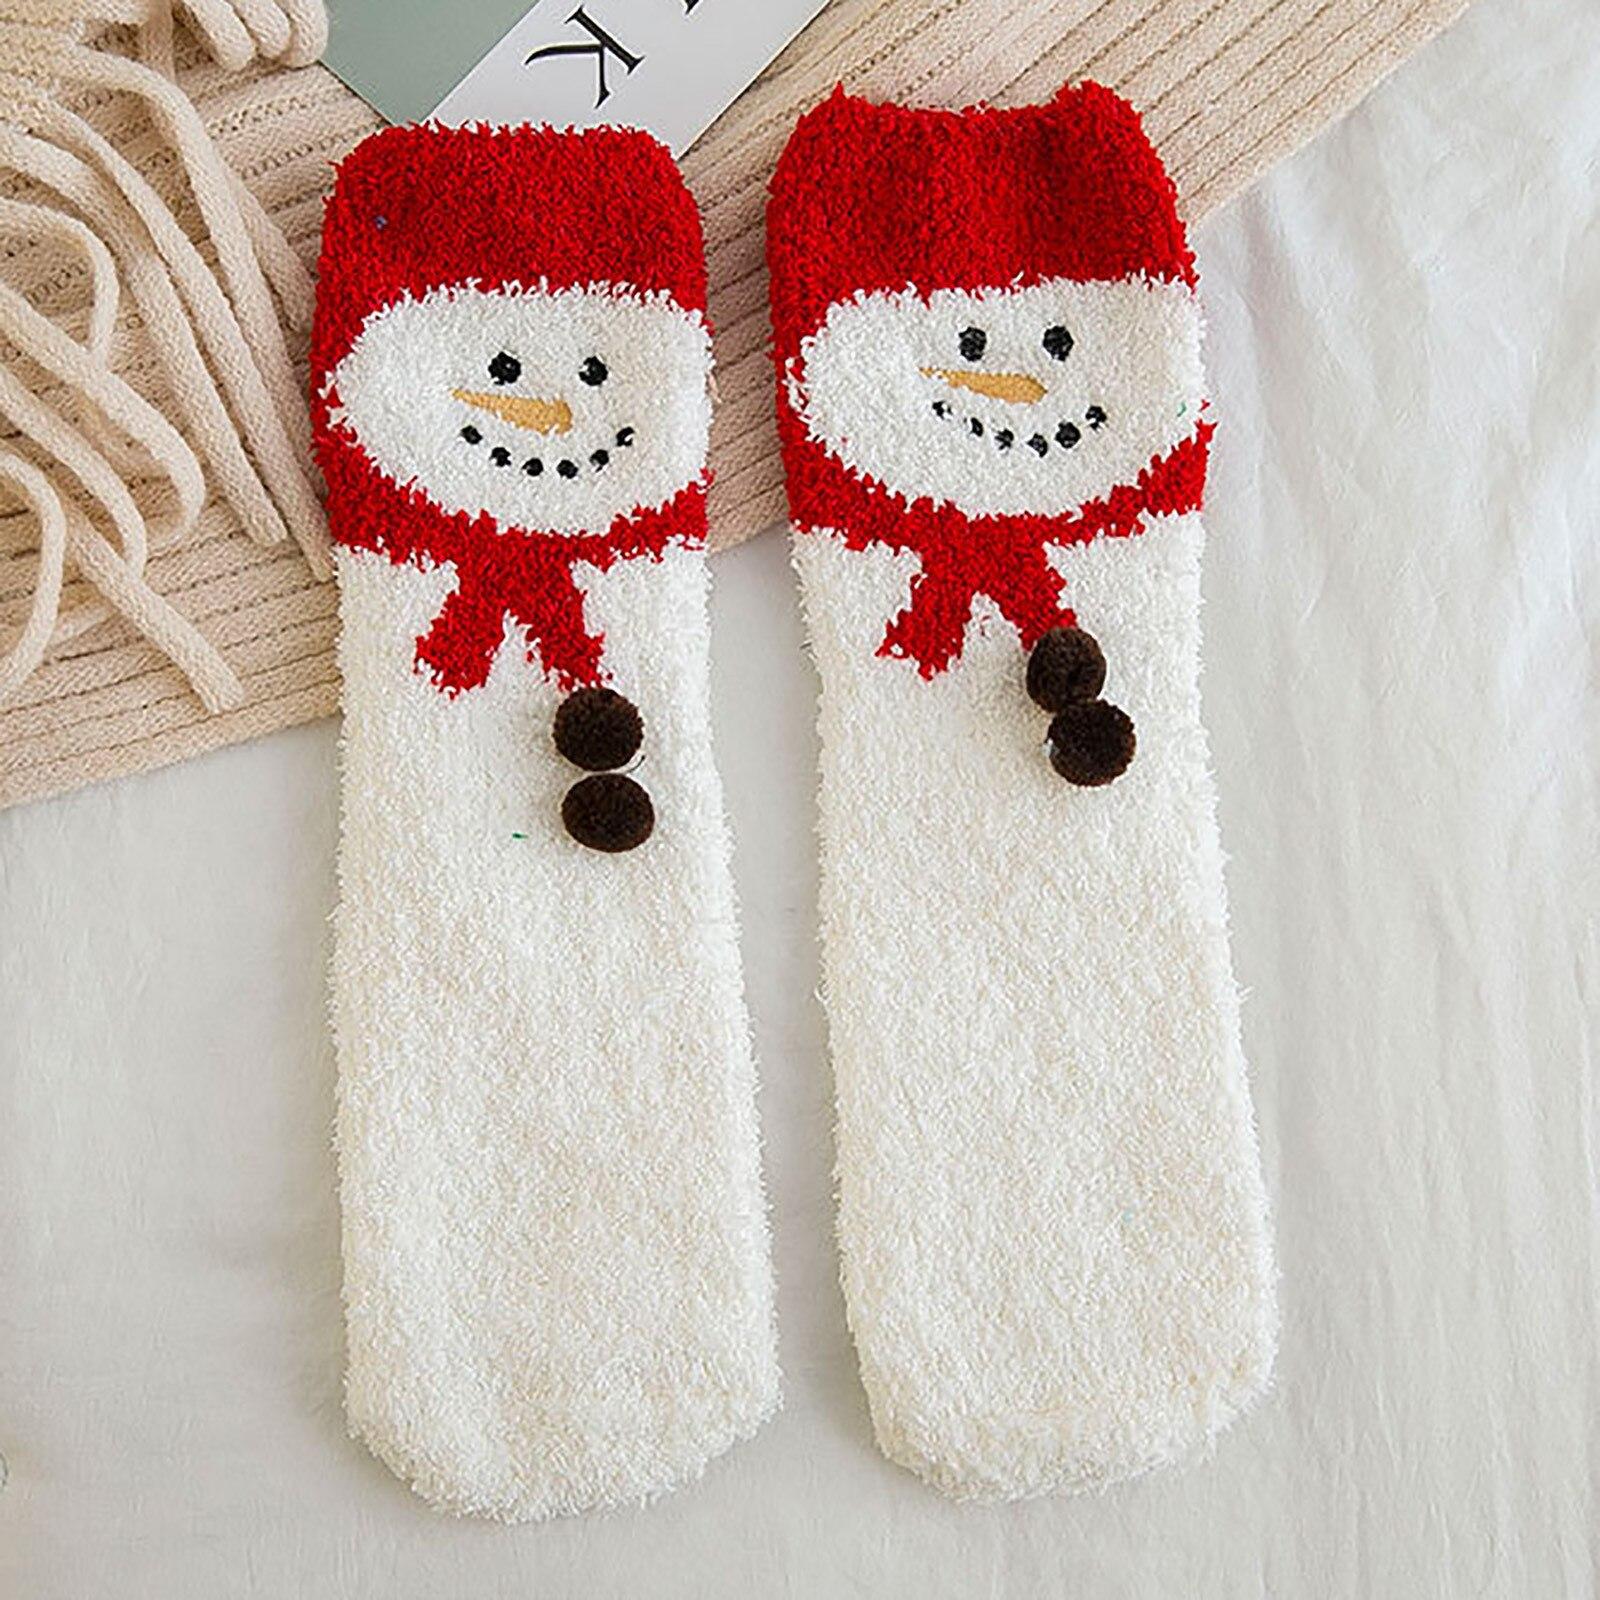 New baby SOCKS SHEEP WOOL Cartoon soft warm deer gift Christmas